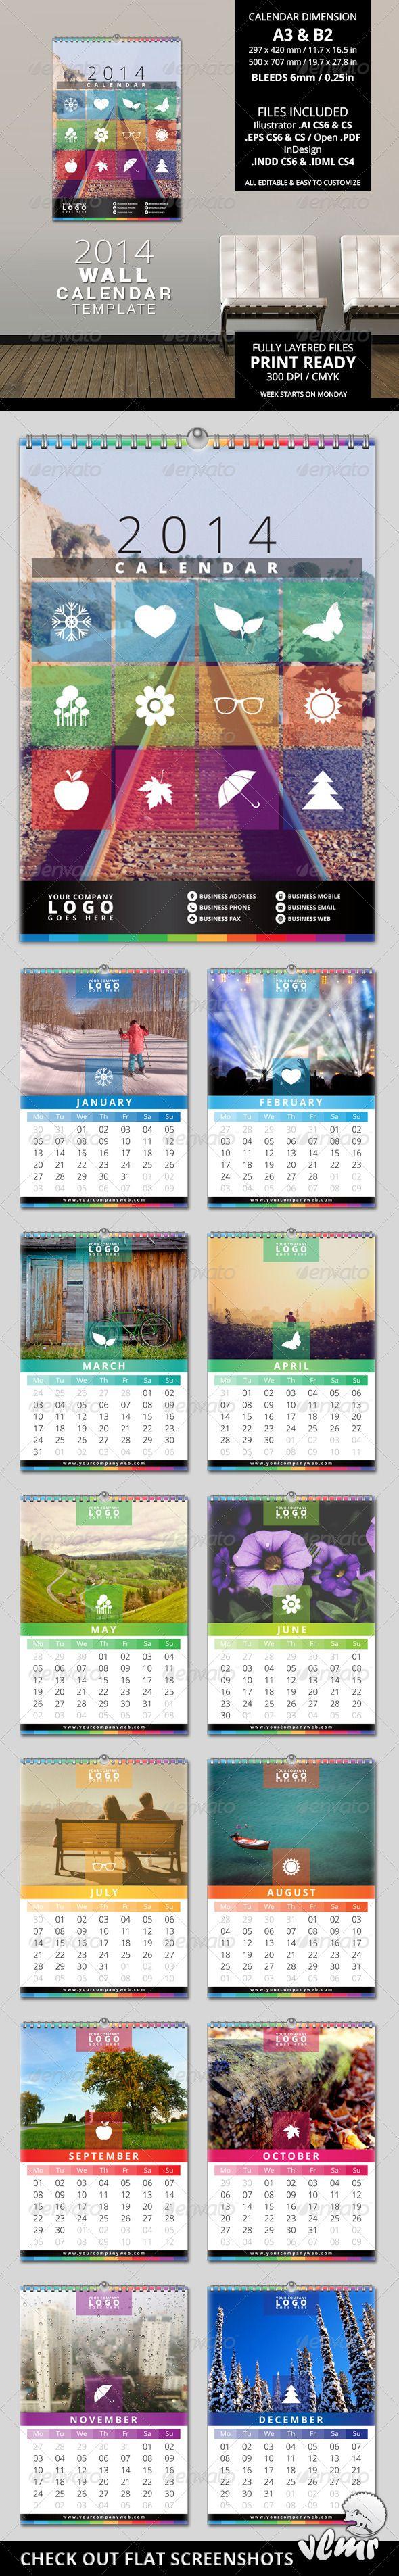 2014 Wall Calendar Template #GraphicRiver